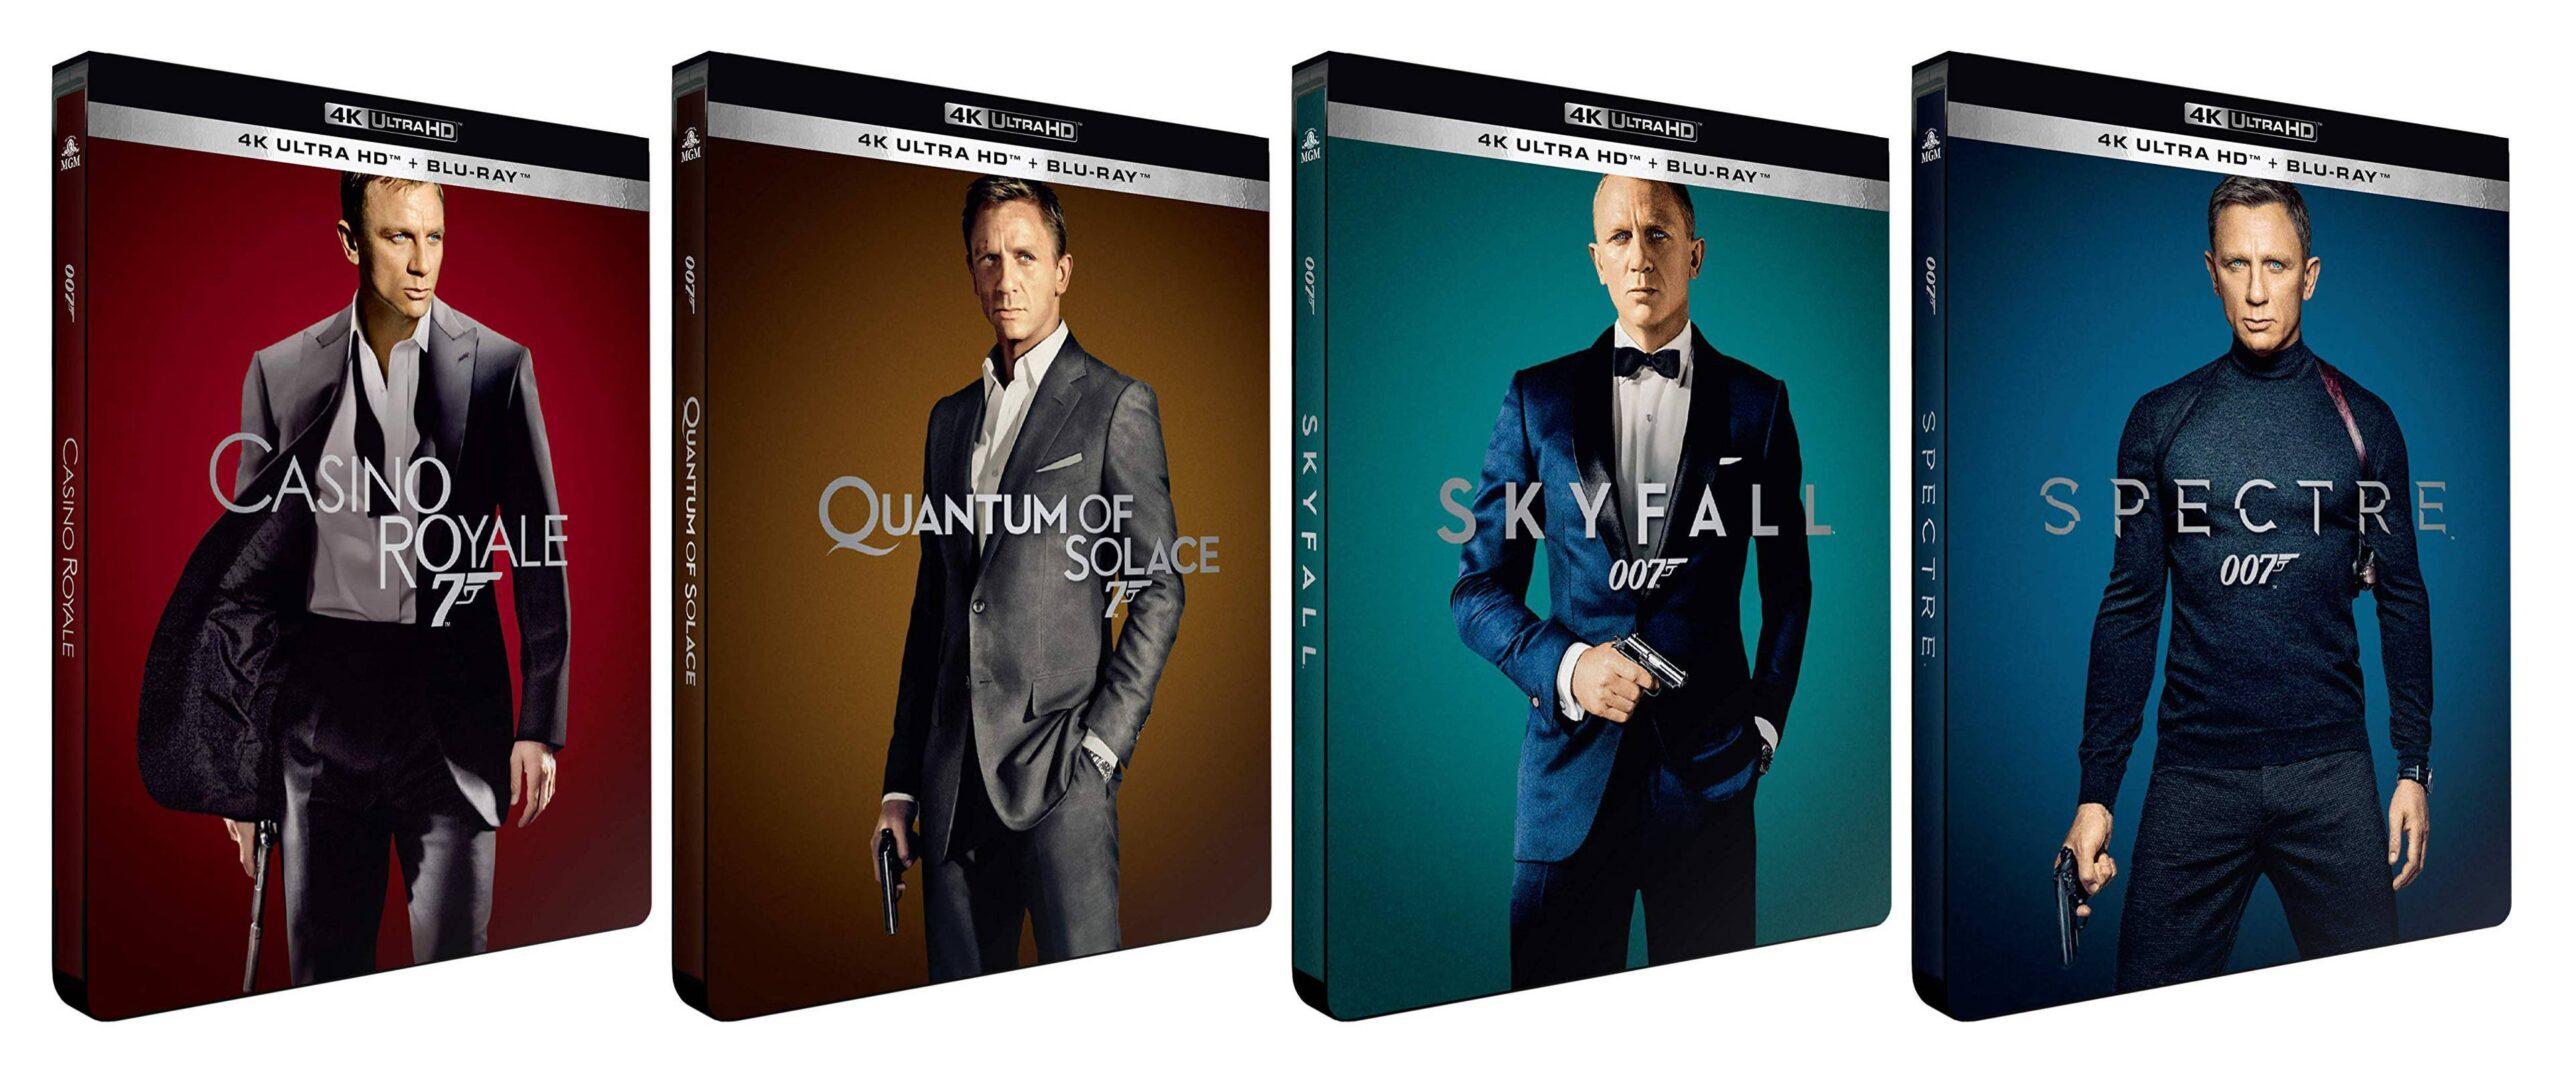 Daniel Craig's | James Bond : 007 – 4 Movies Collection (2006 – 2015) in 4K & 1080p BluRay [Tamil-Telugu-Hindi (BD 5.1 448Kbps)] [Eng (DTS-HD MA 5.1)] MSubs ~ Encoded By ~ JackSparrow038